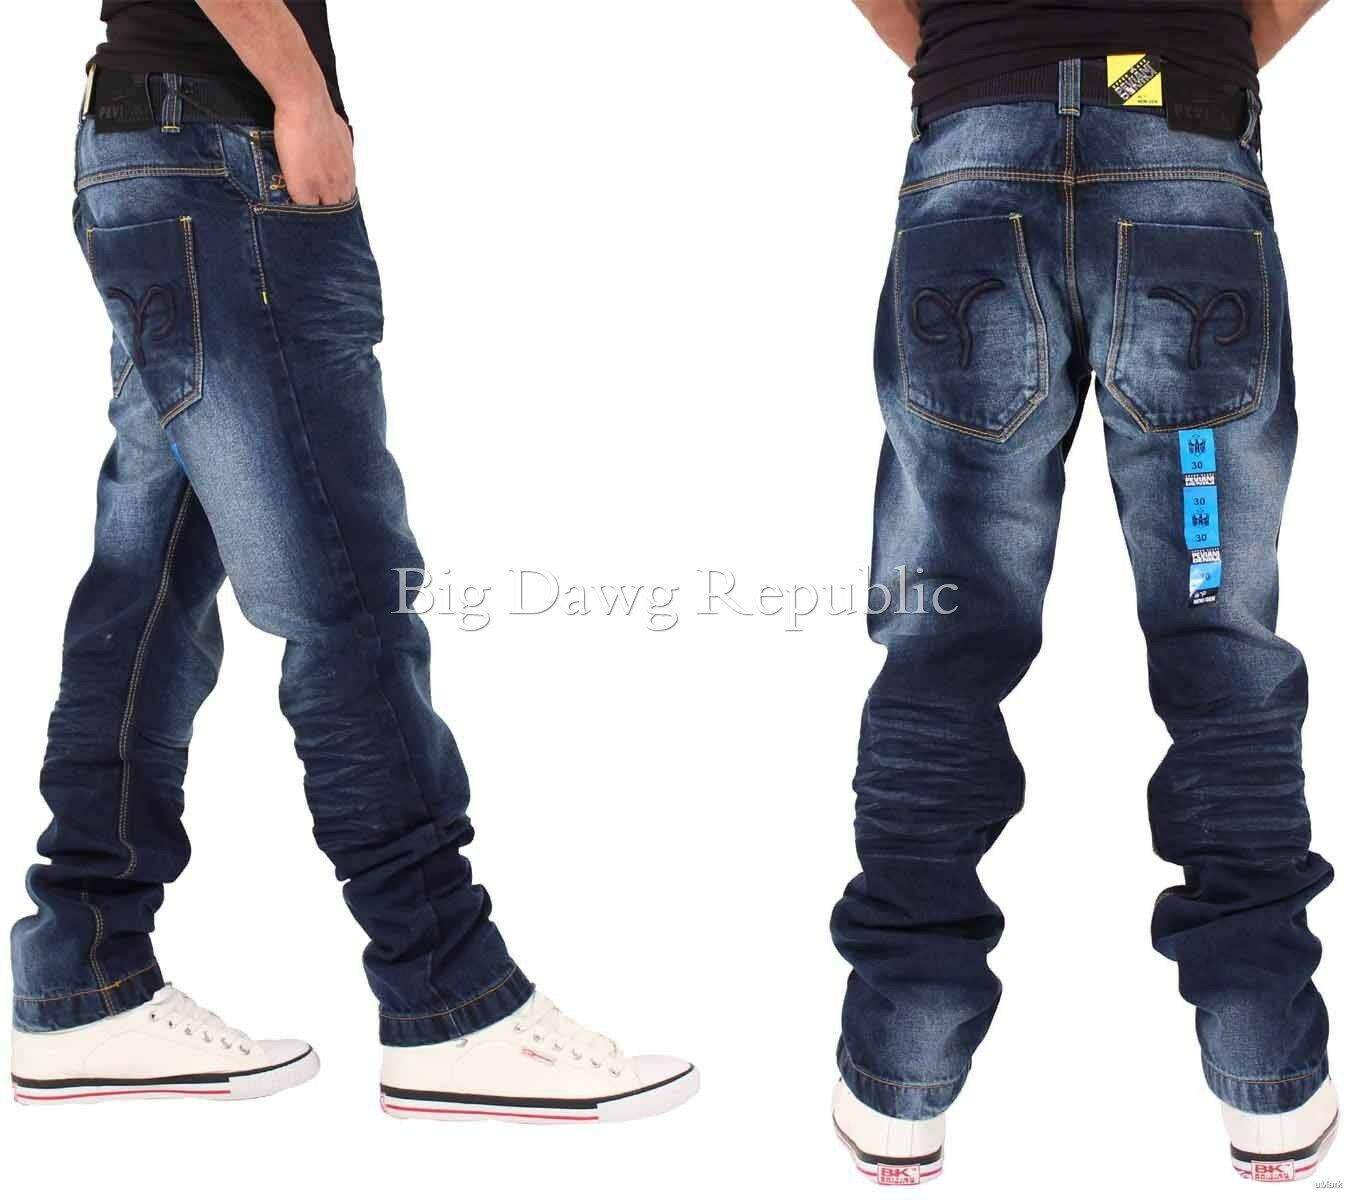 Peviani Men's Designer Denim Jeans, Is Time Money, Pants, Trousers, Buknham DB